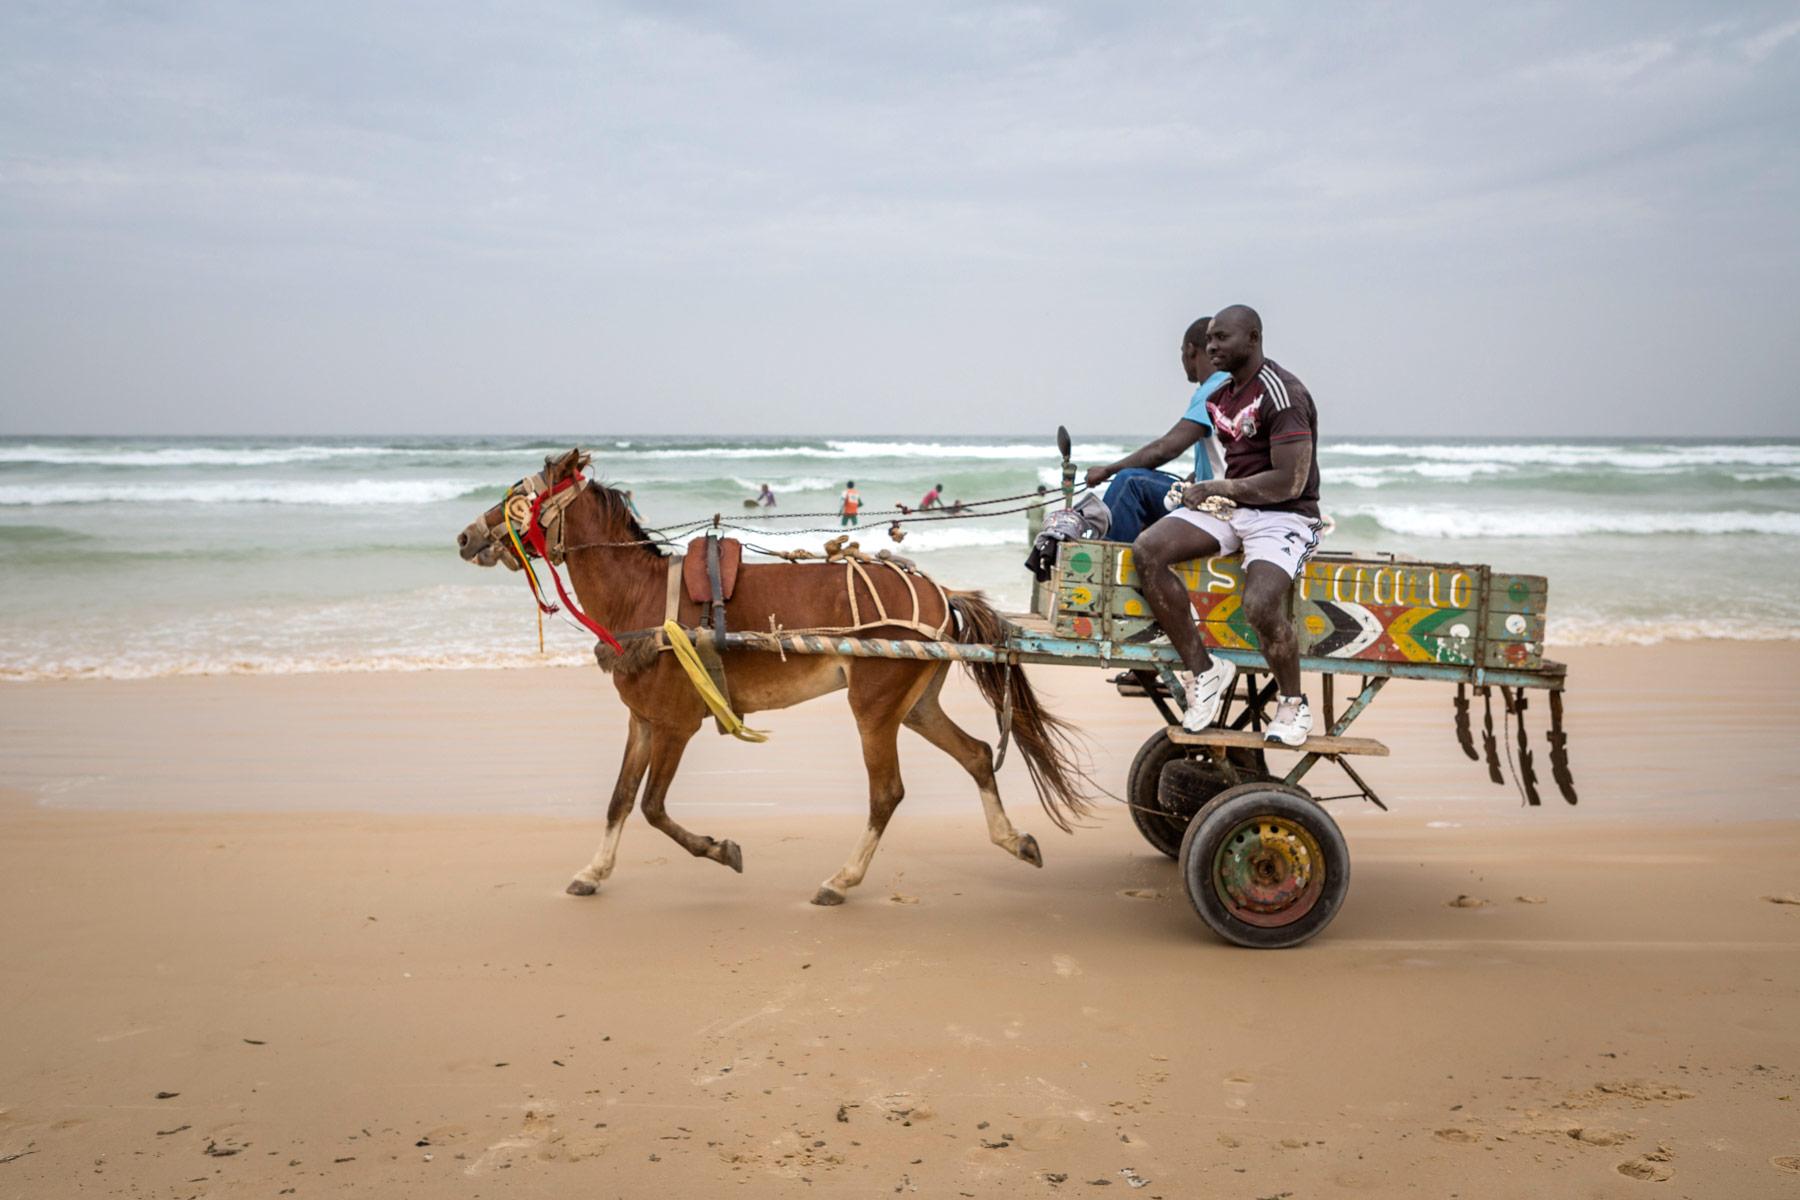 donkey-cart-on-beach_BobbiLe-Ba-Photography_2015-111